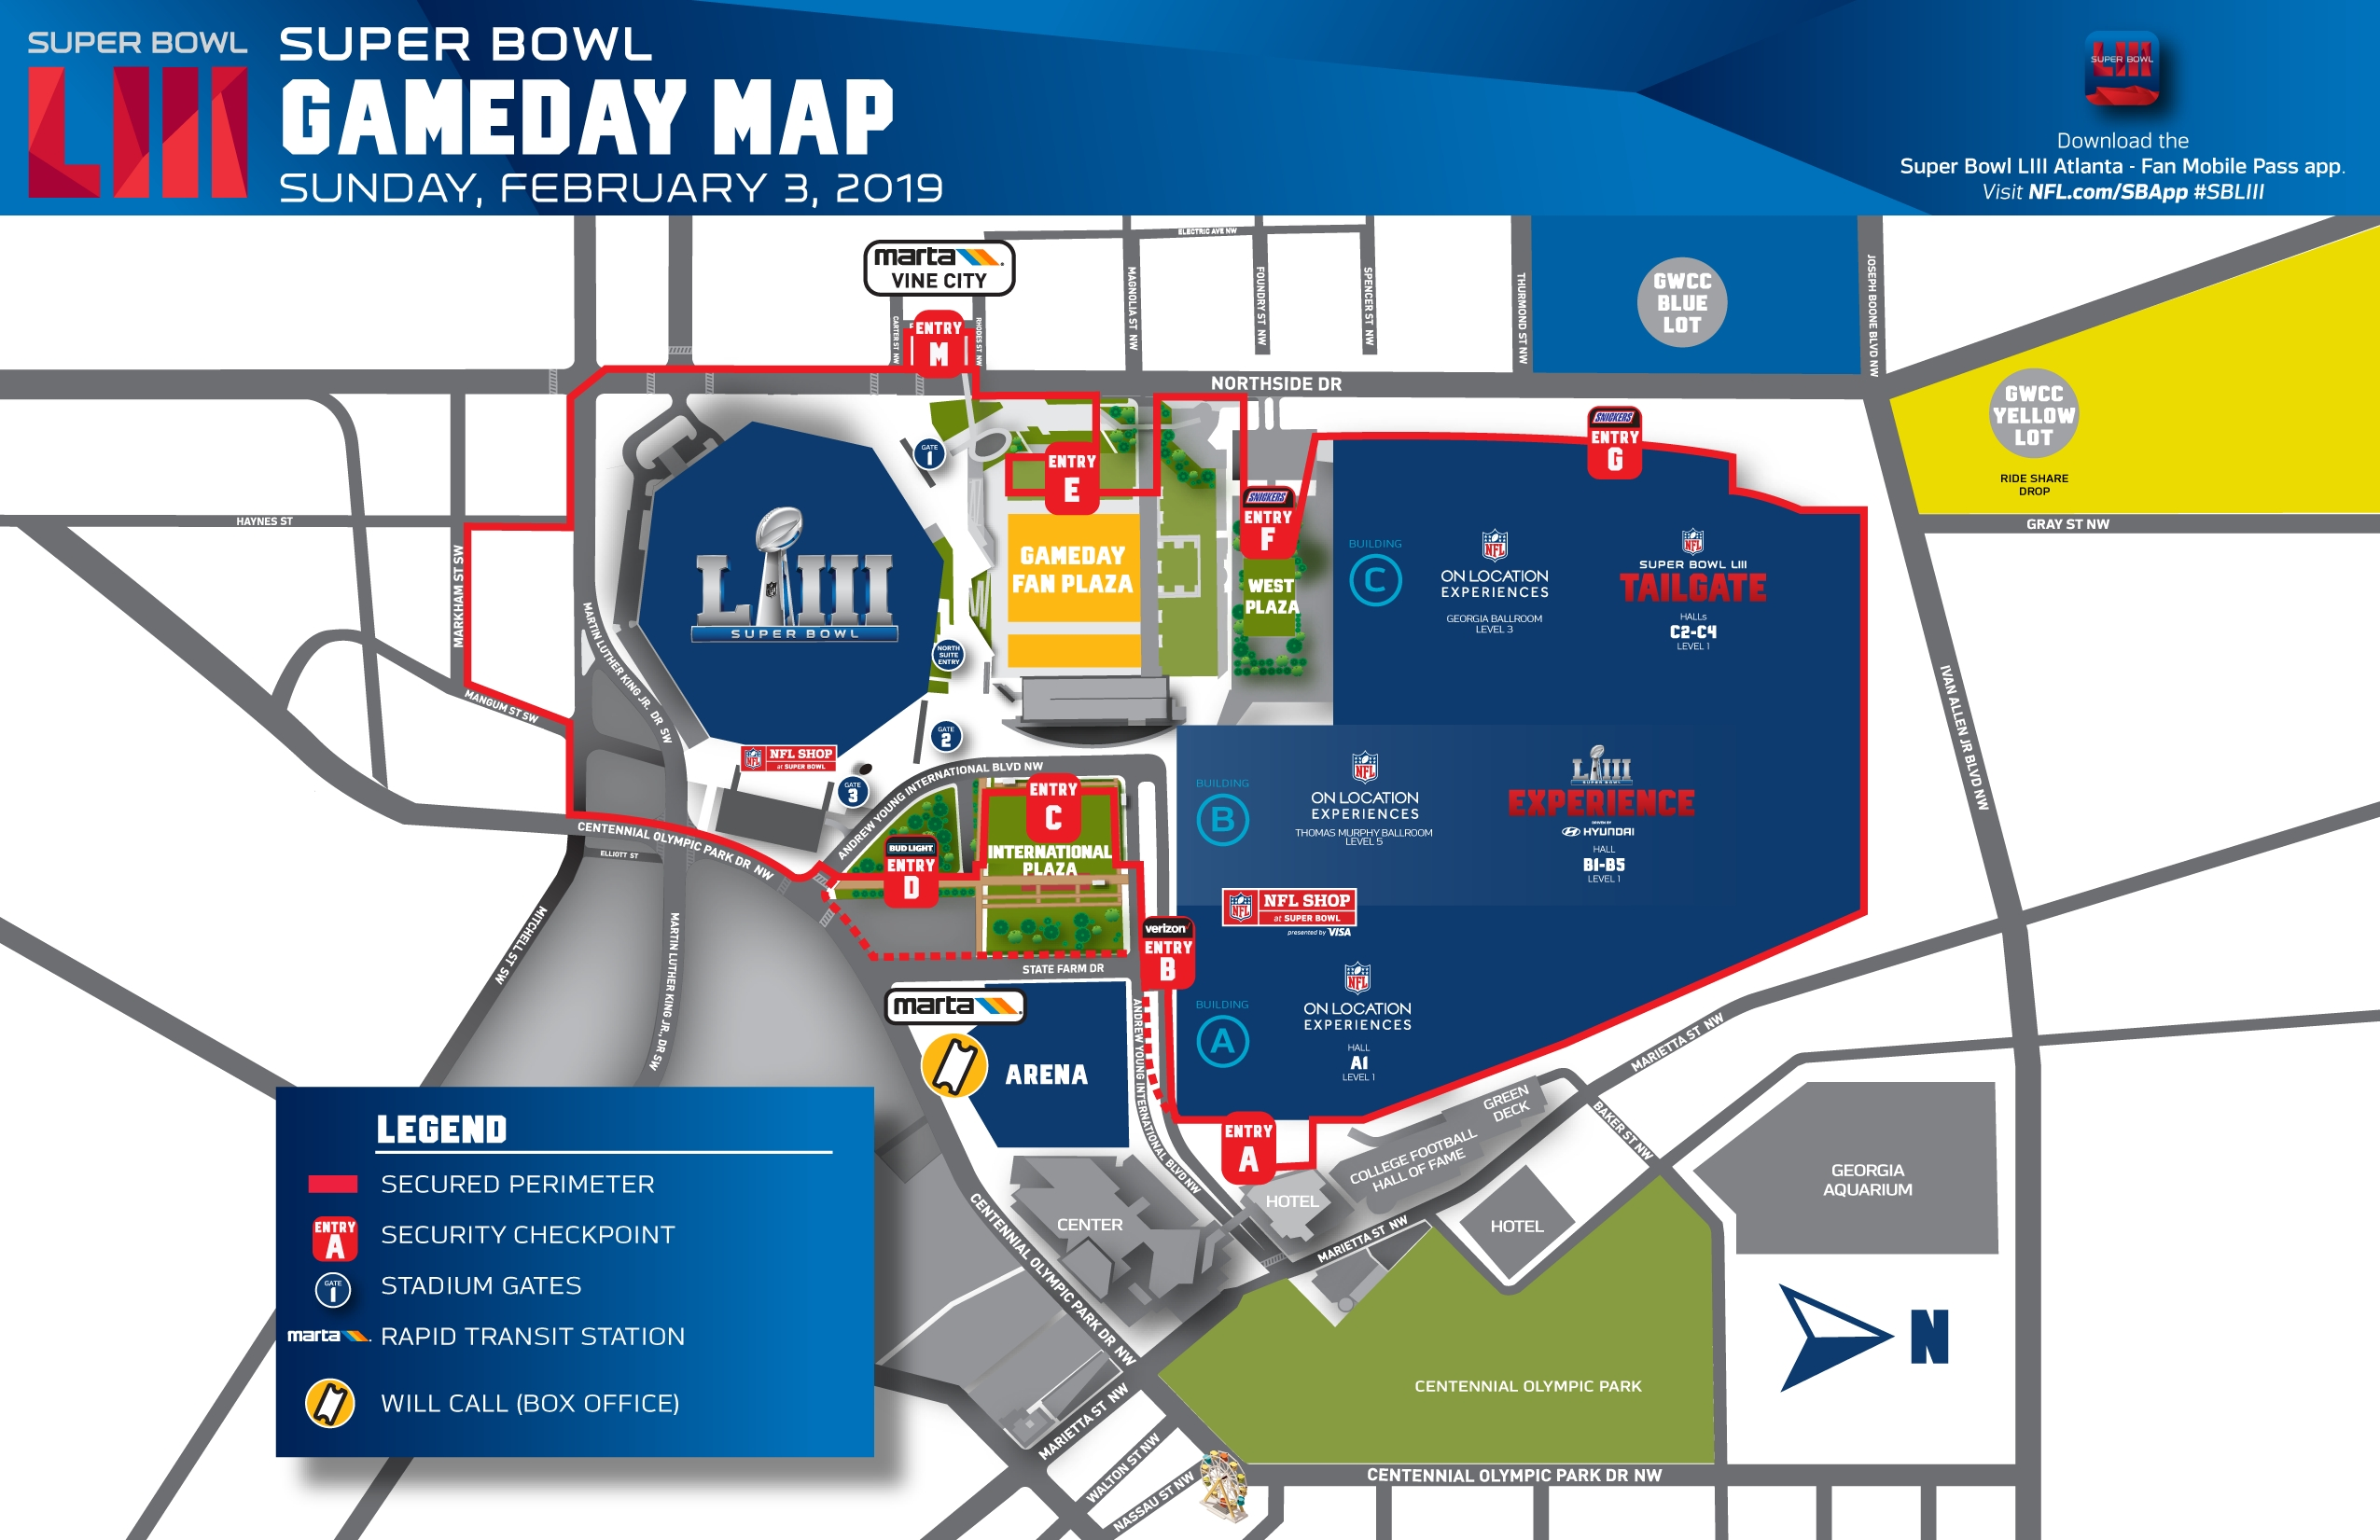 Super Bowl Game Details | Nfl | Nfl with Super Bowl Game Day Map